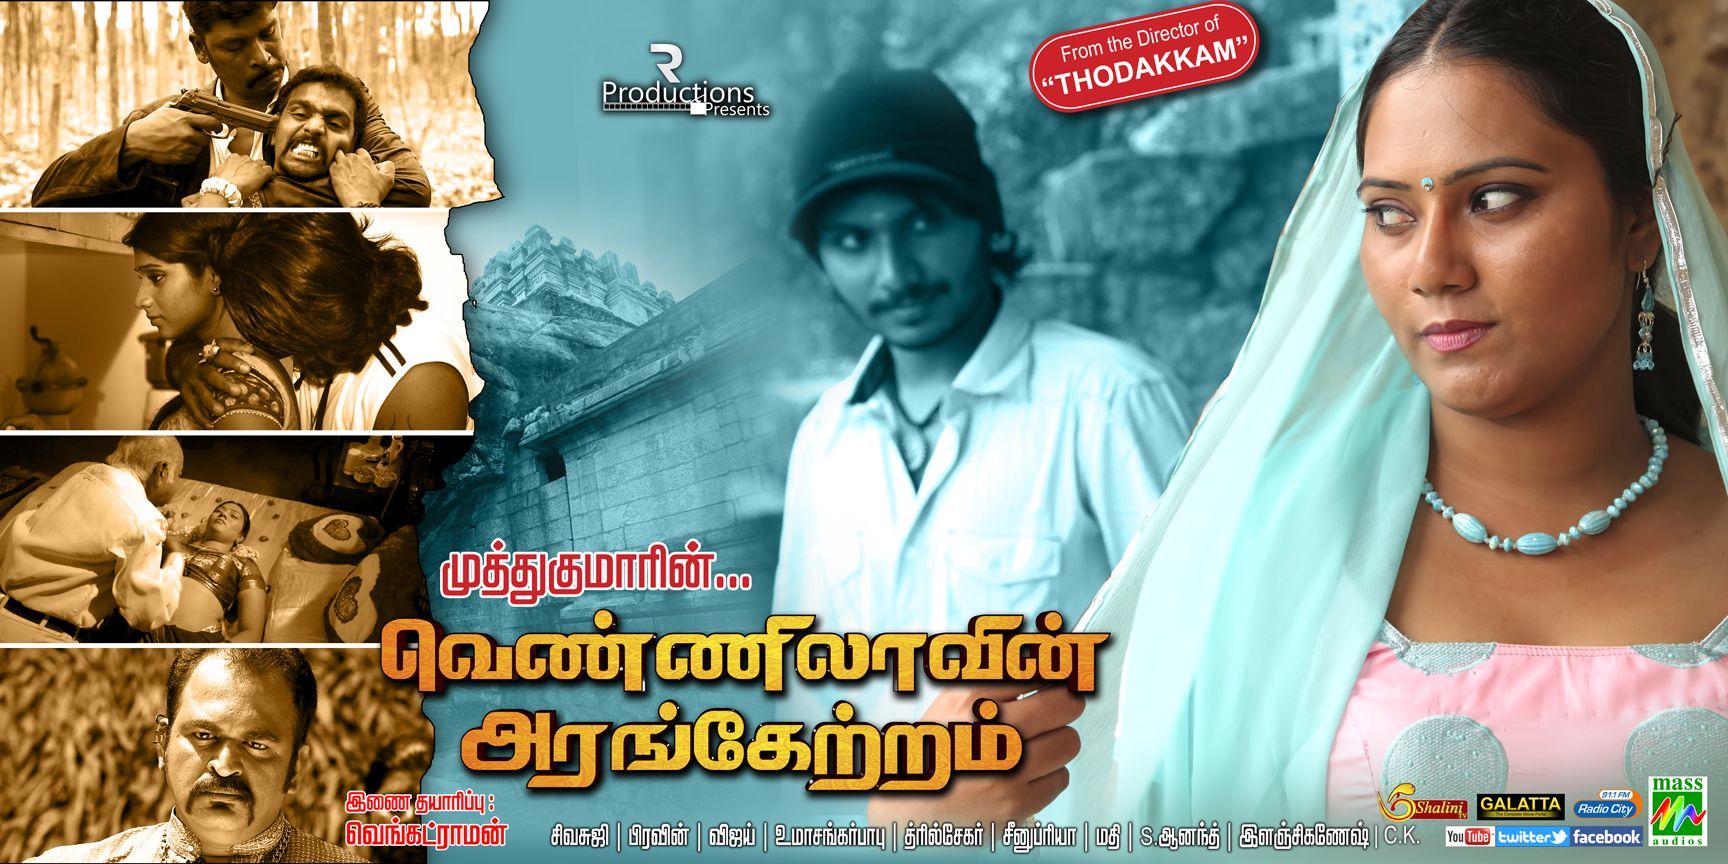 Contact Buyers & Distributors Film: Vennilavin Arangetram Tamil & Telugu Coming Soon in Theaters Don't Miss it! Watch your near Theaters....